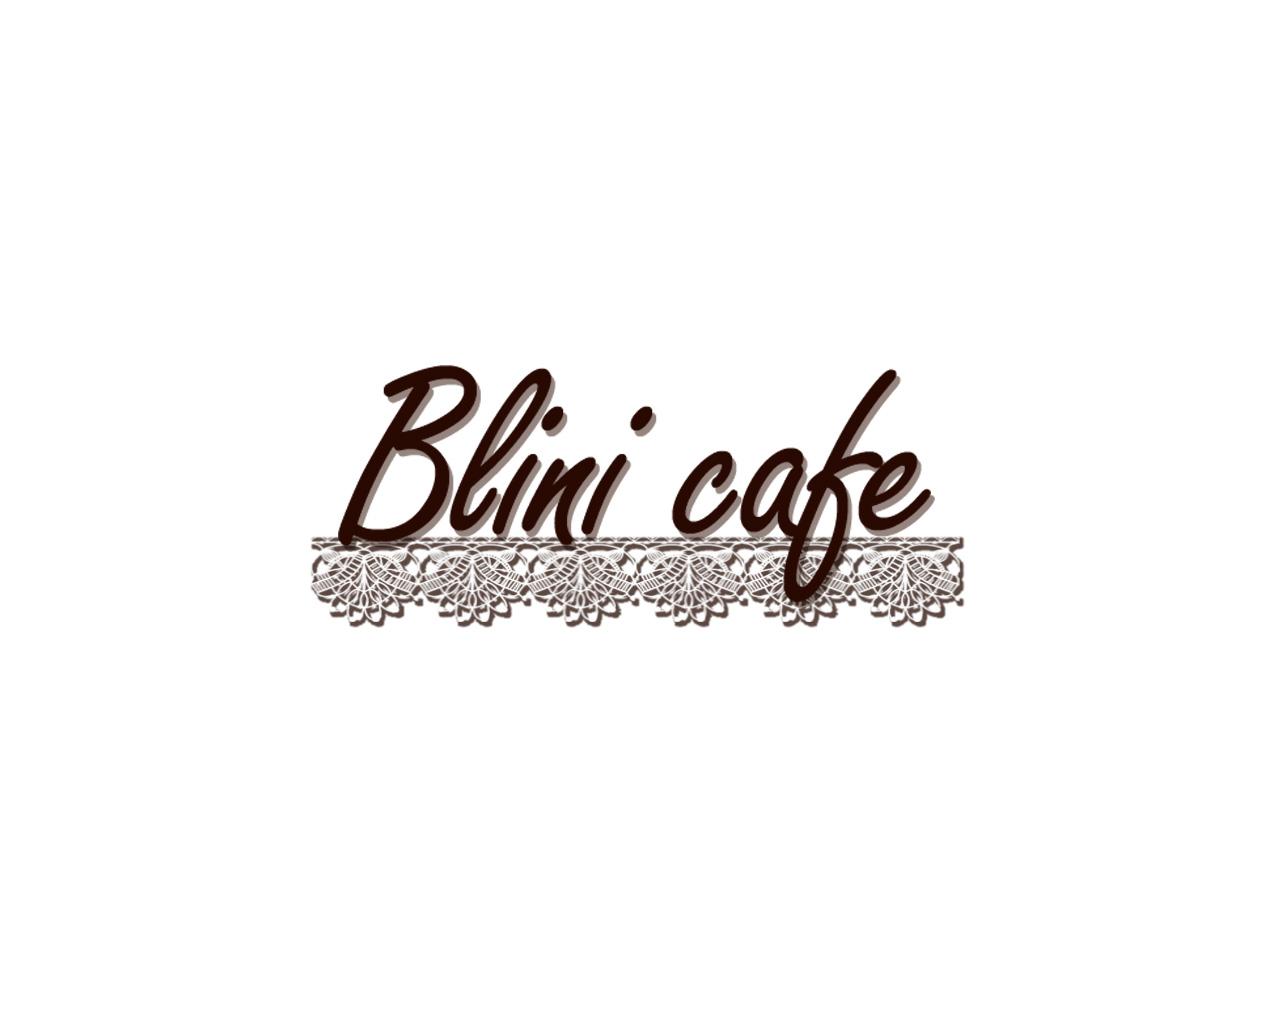 Logo Design by Ioanna Rokka - Entry No. 56 in the Logo Design Contest Creative Logo Design for Blinì.